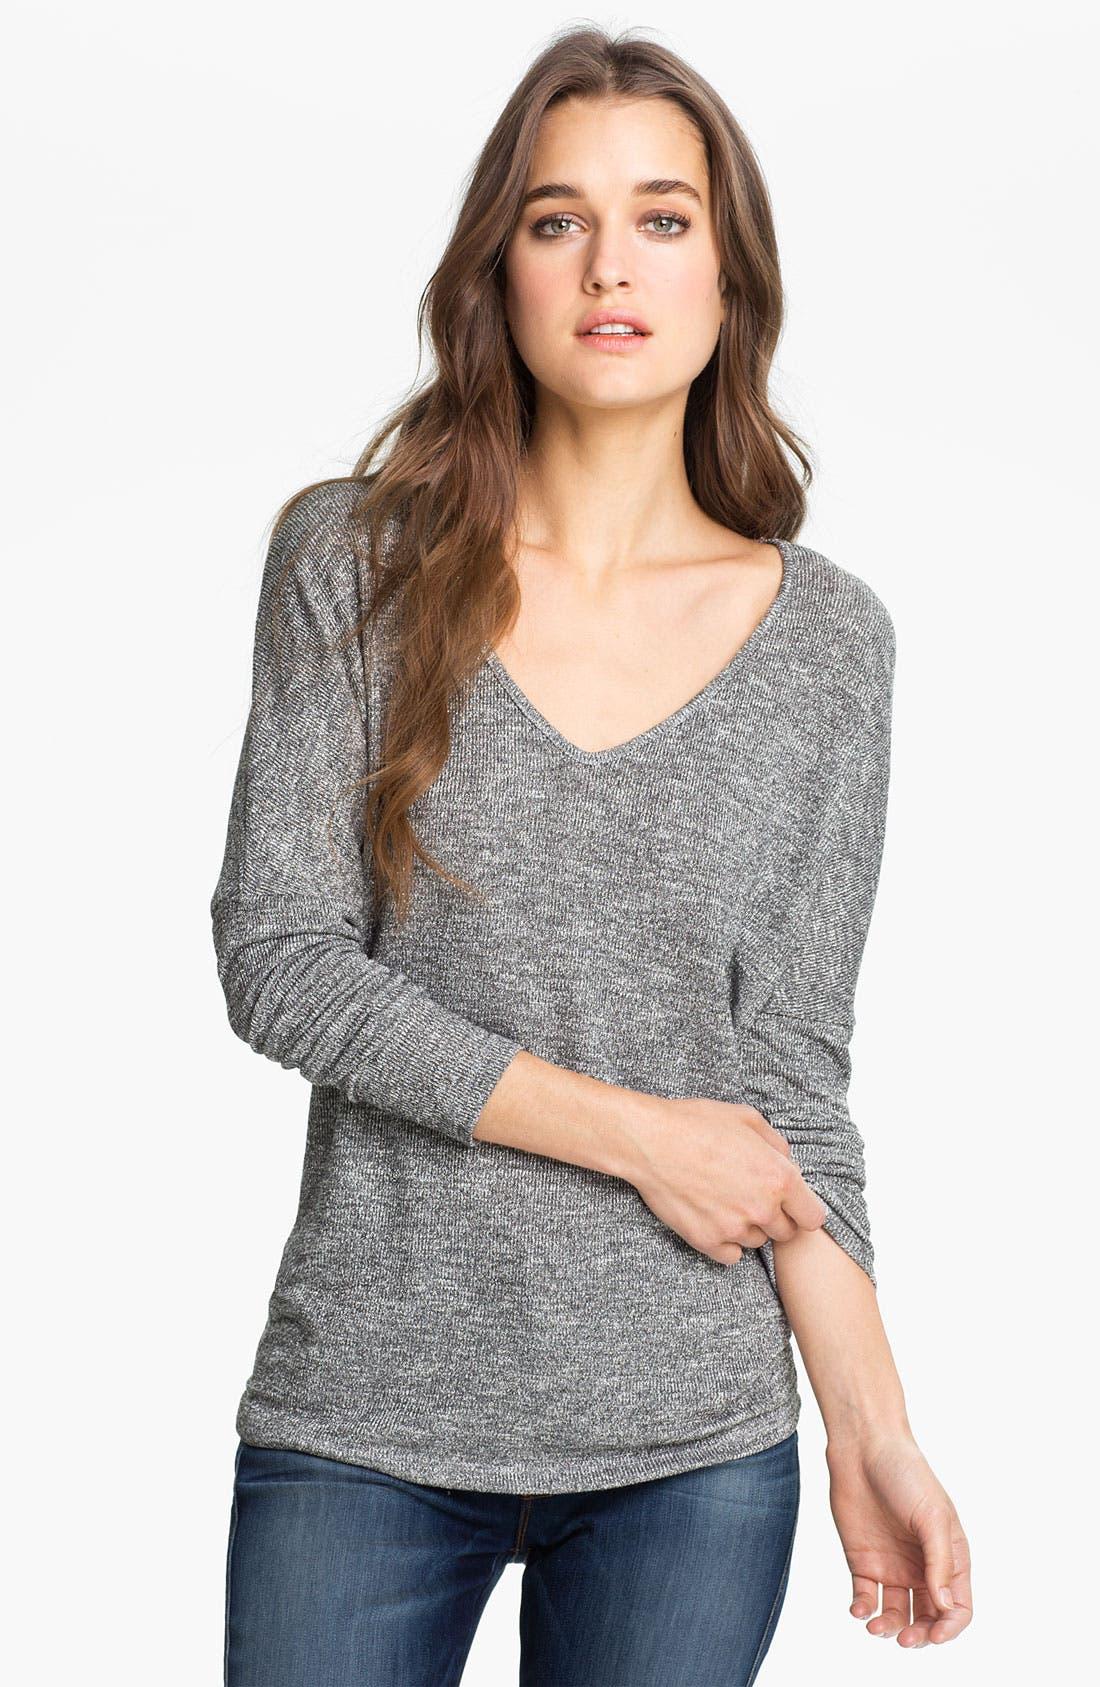 Main Image - Velvet Oversized Metallic Sweater (Nordstrom Exclusive)